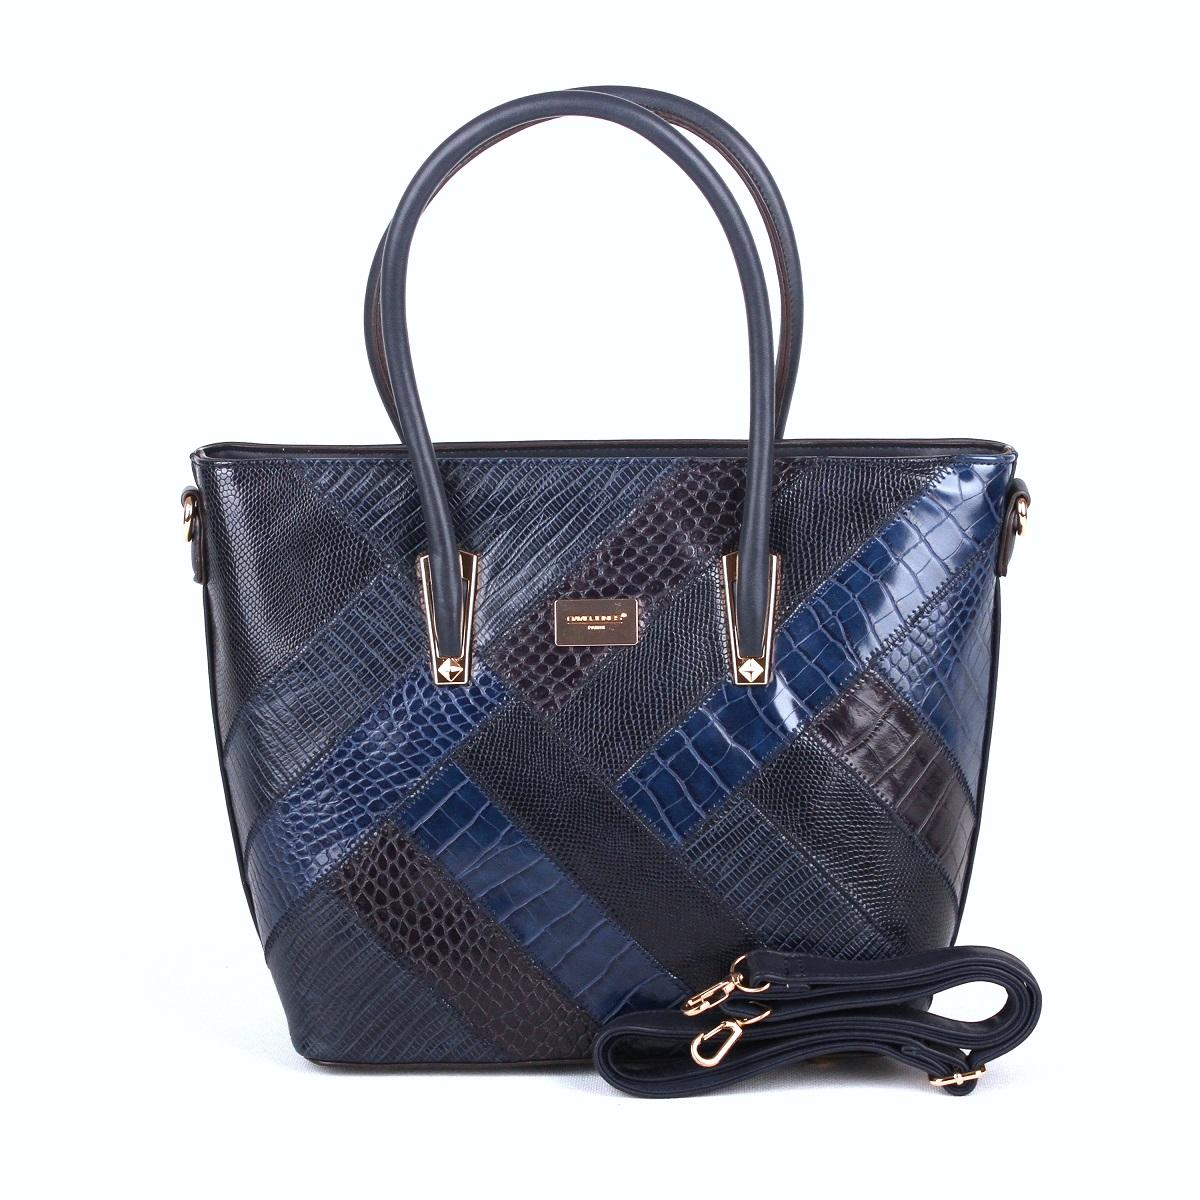 Modrá kabelka do ruky David Jones 5206-5